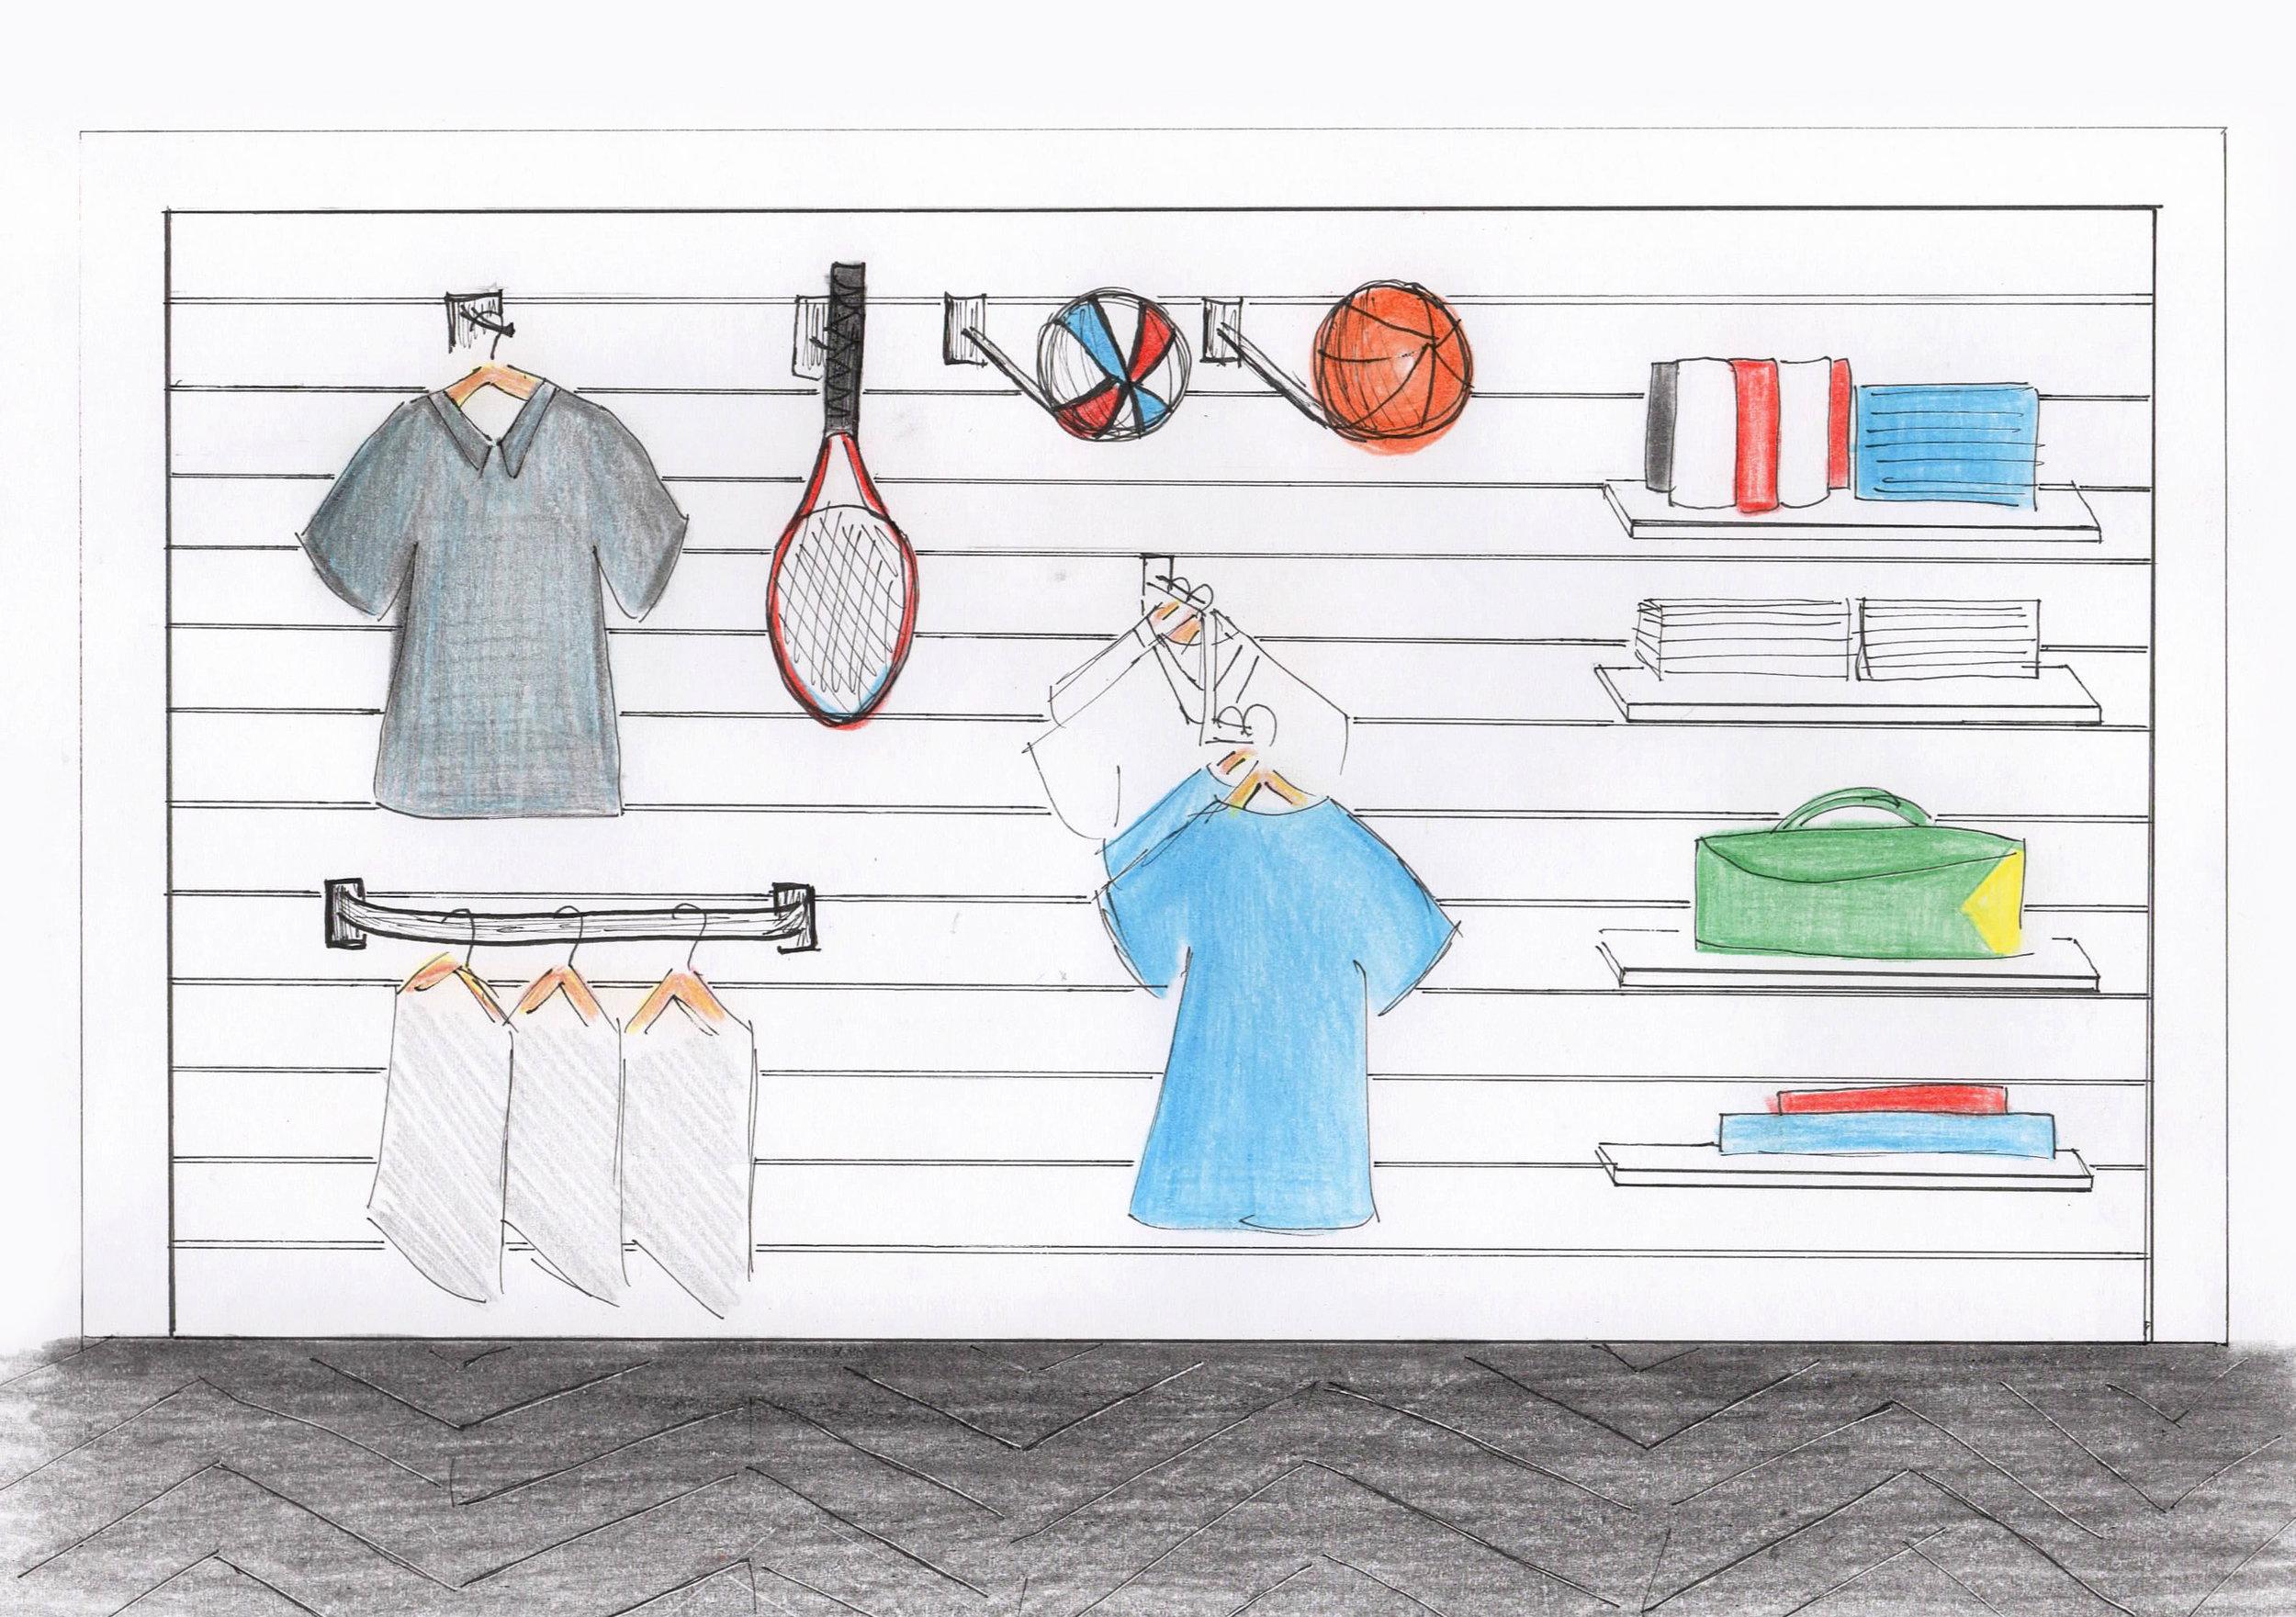 Sports shop Slatwall sketch